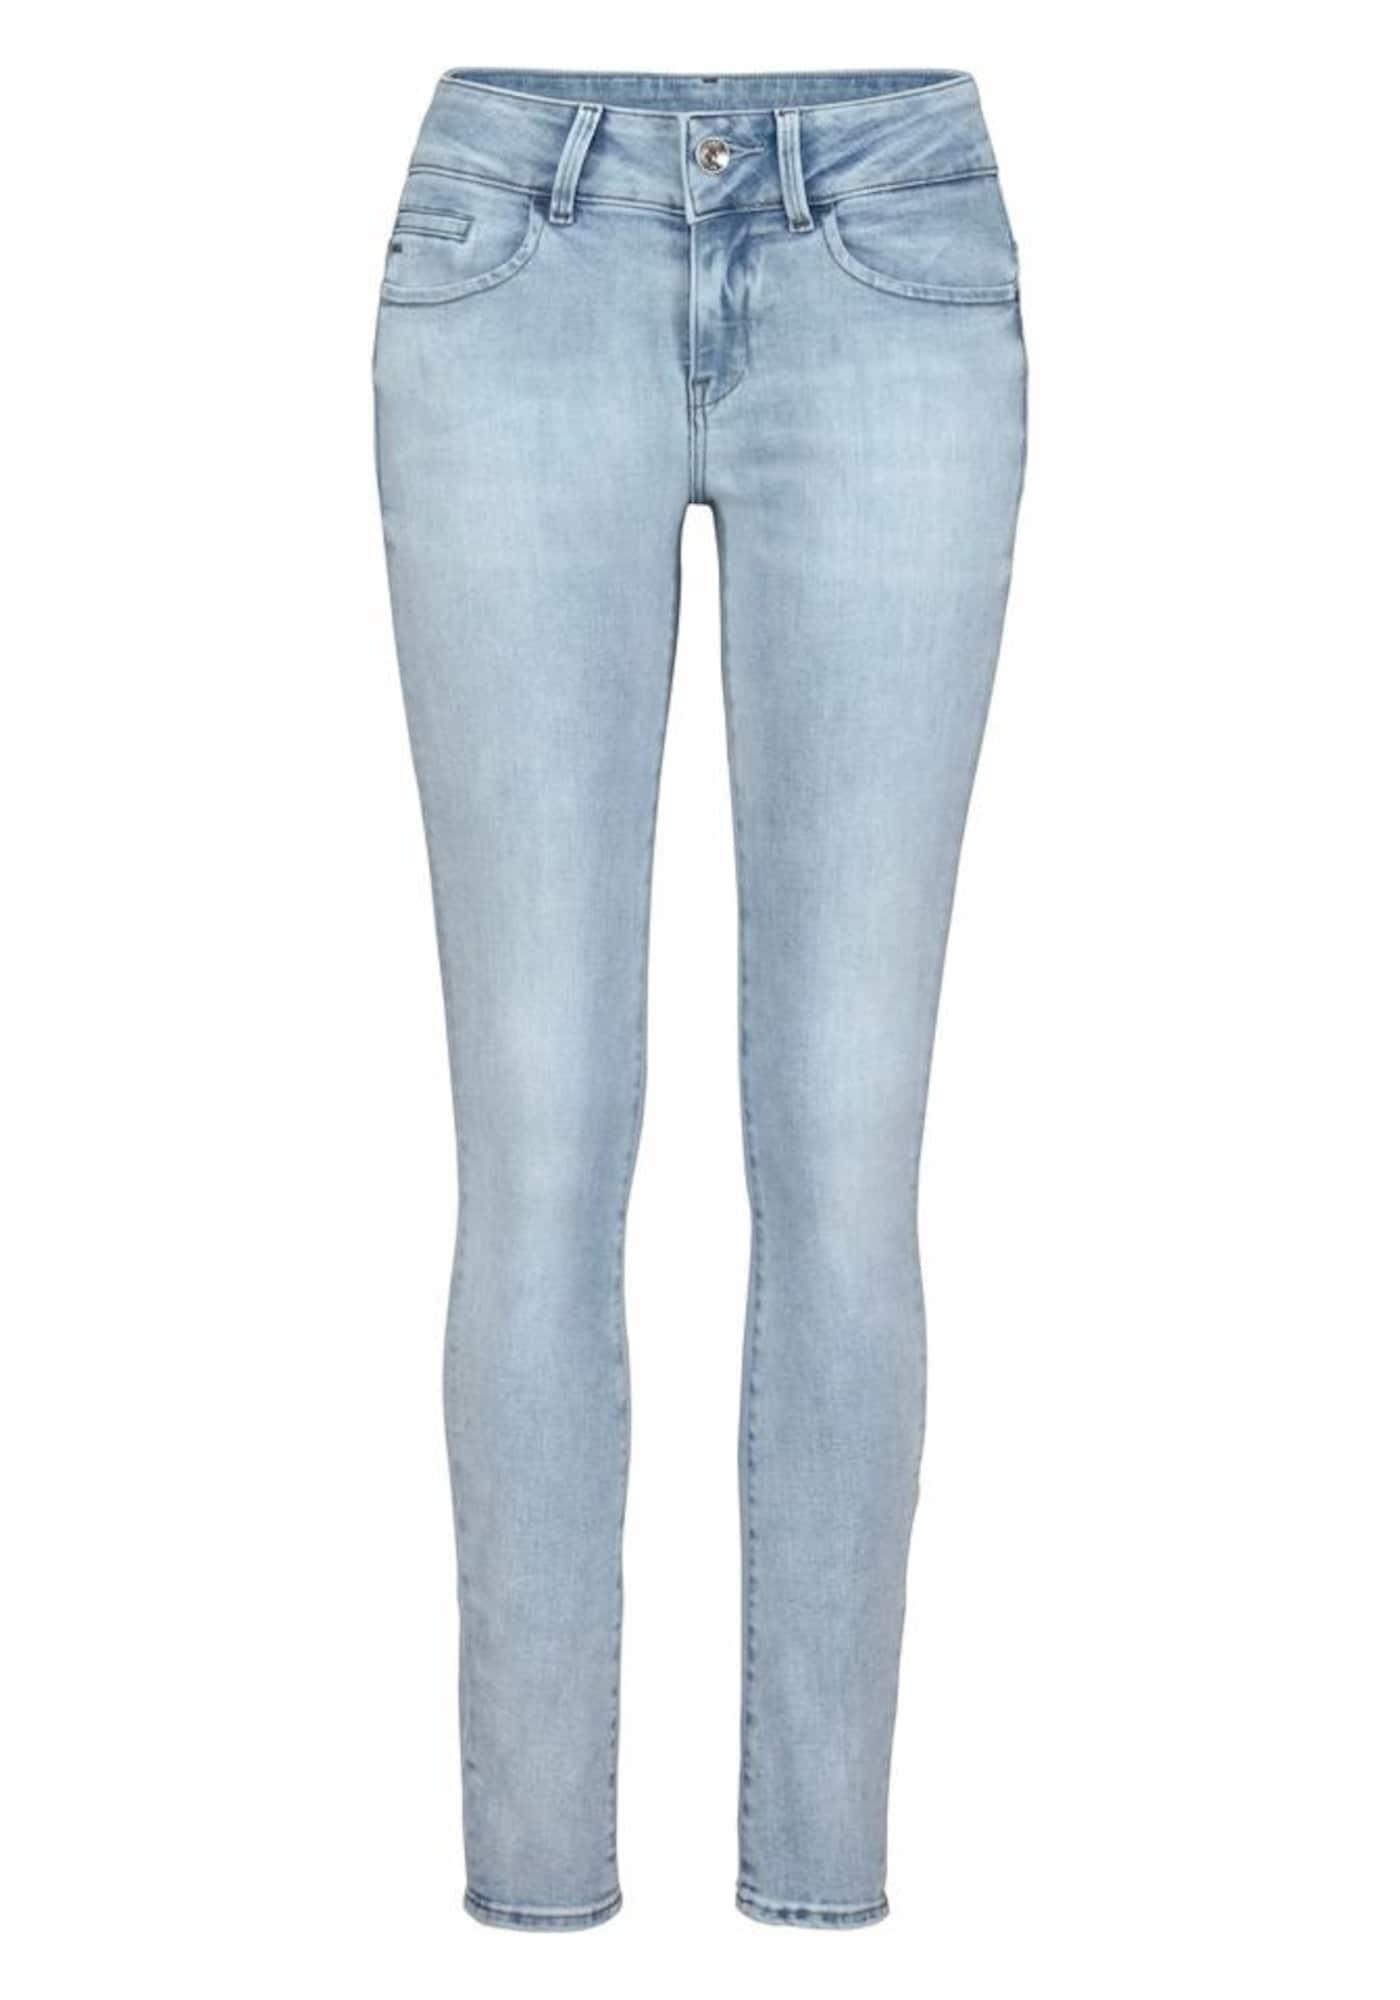 G-STAR RAW Dames Jeans Midge Cody lichtblauw